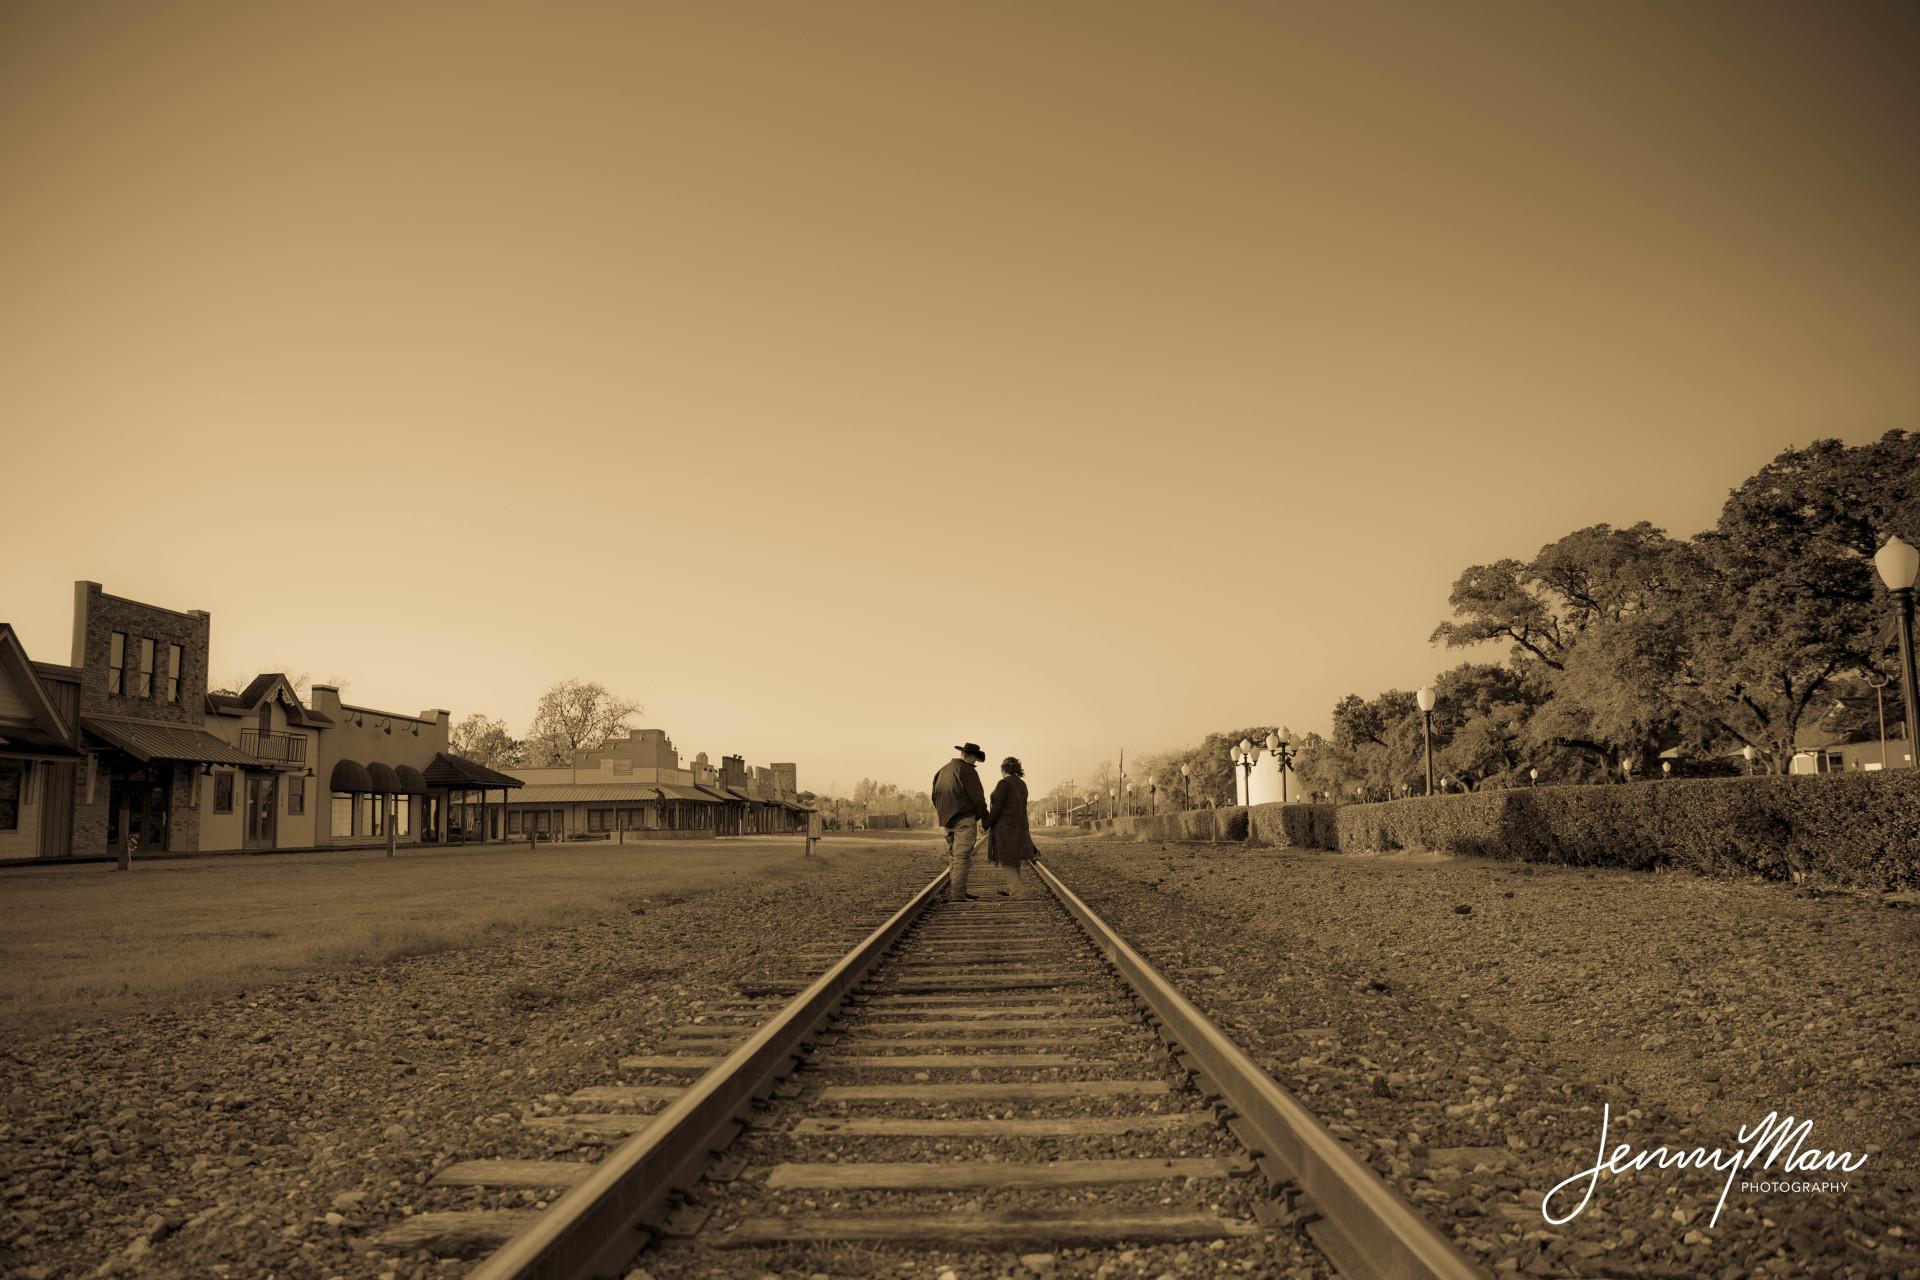 Jenny Man Photography